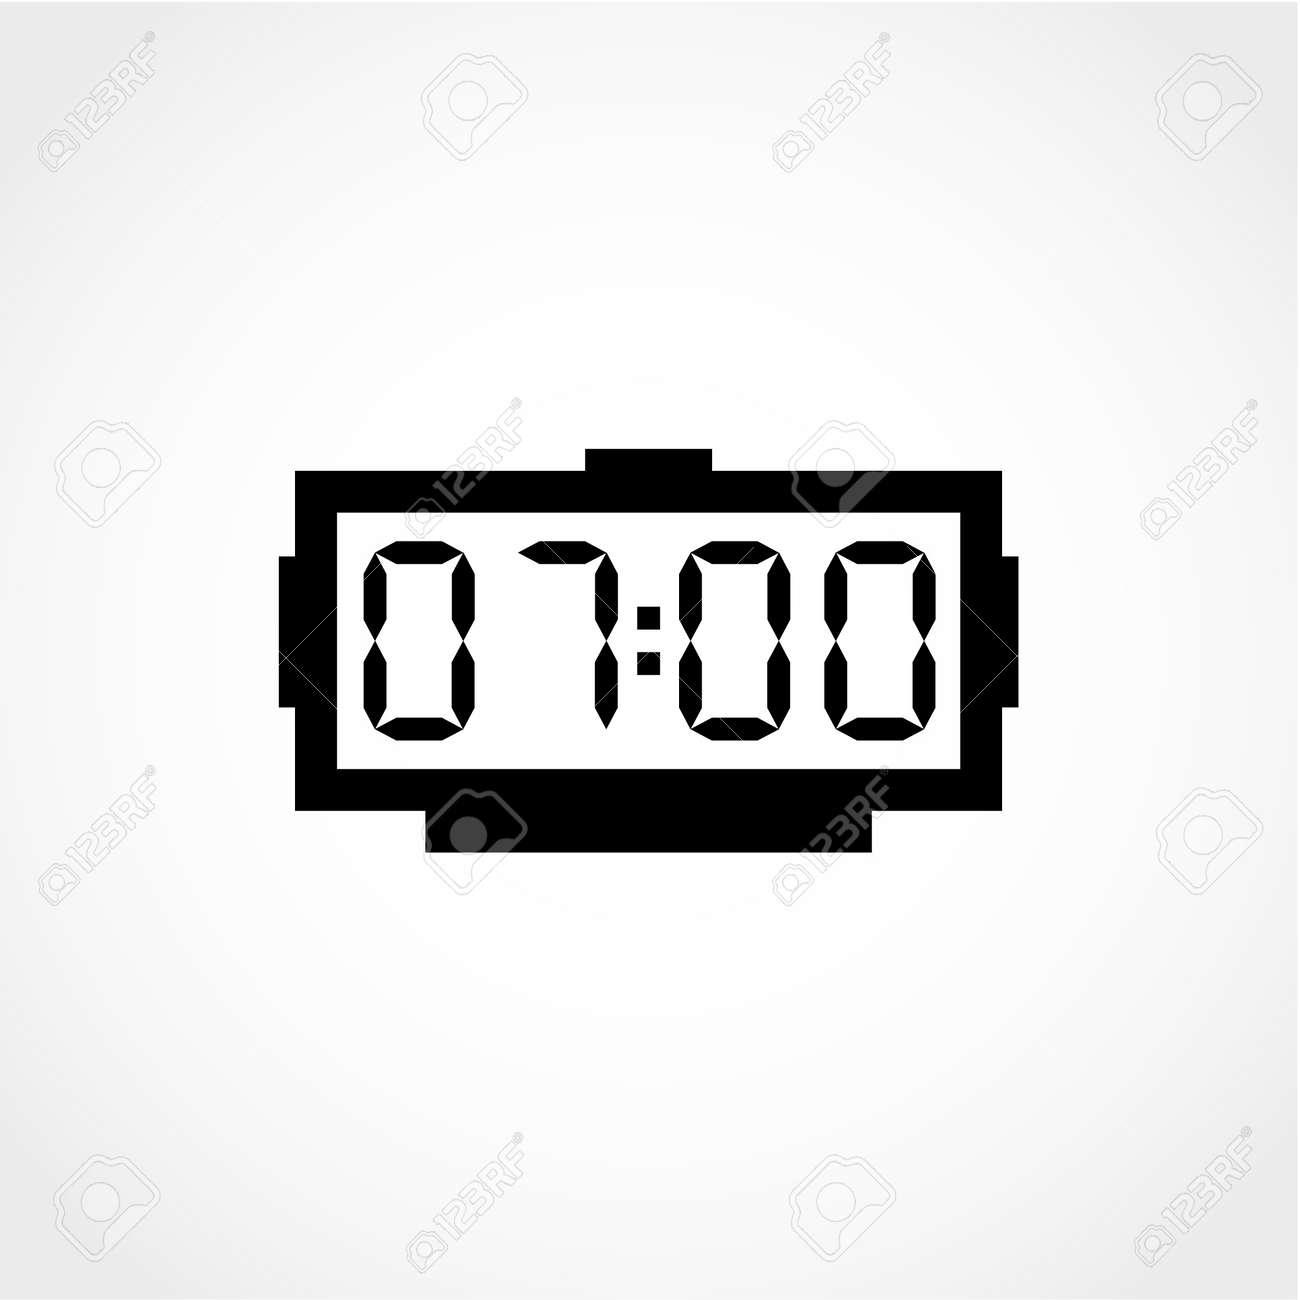 digital alarm clock icon isolated on white background royalty free rh 123rf com Digital Clock Numbers Analog Clock Clip Art